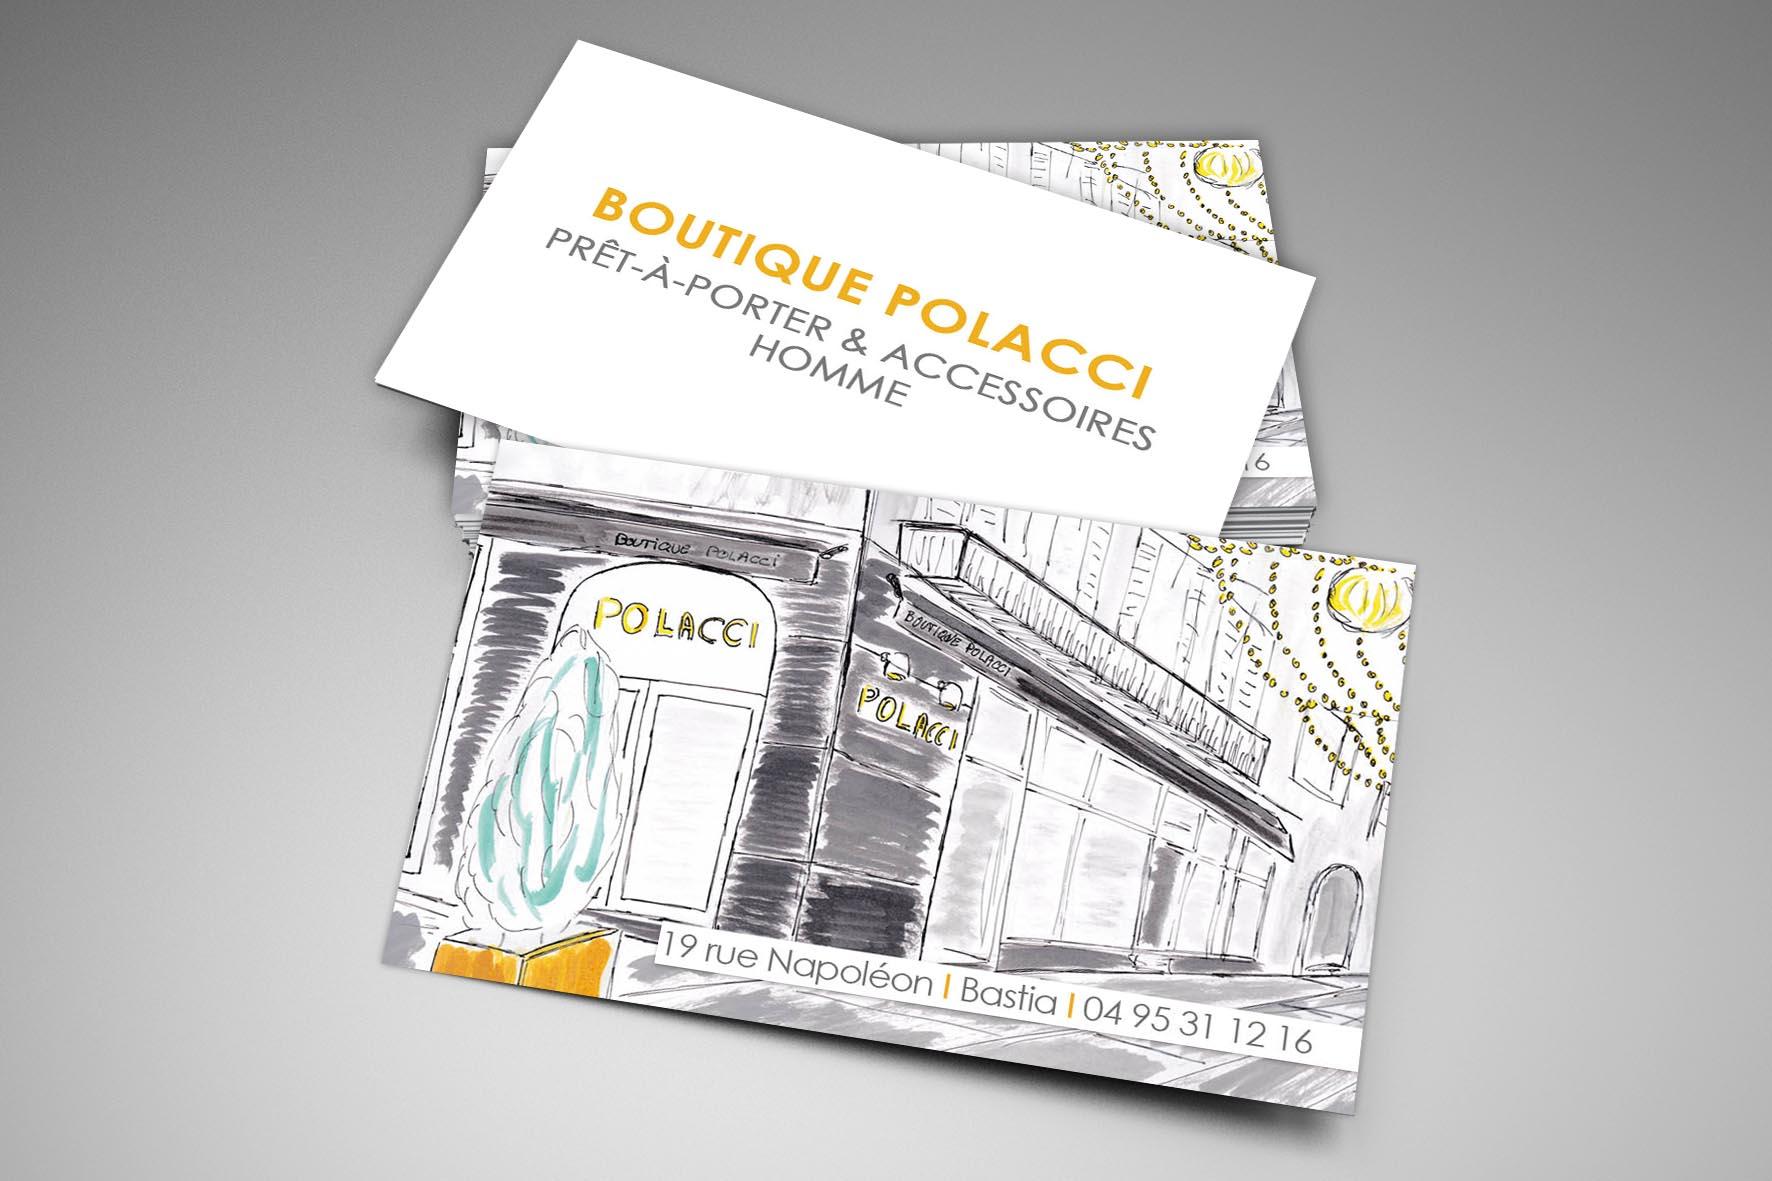 Boutique Polacci